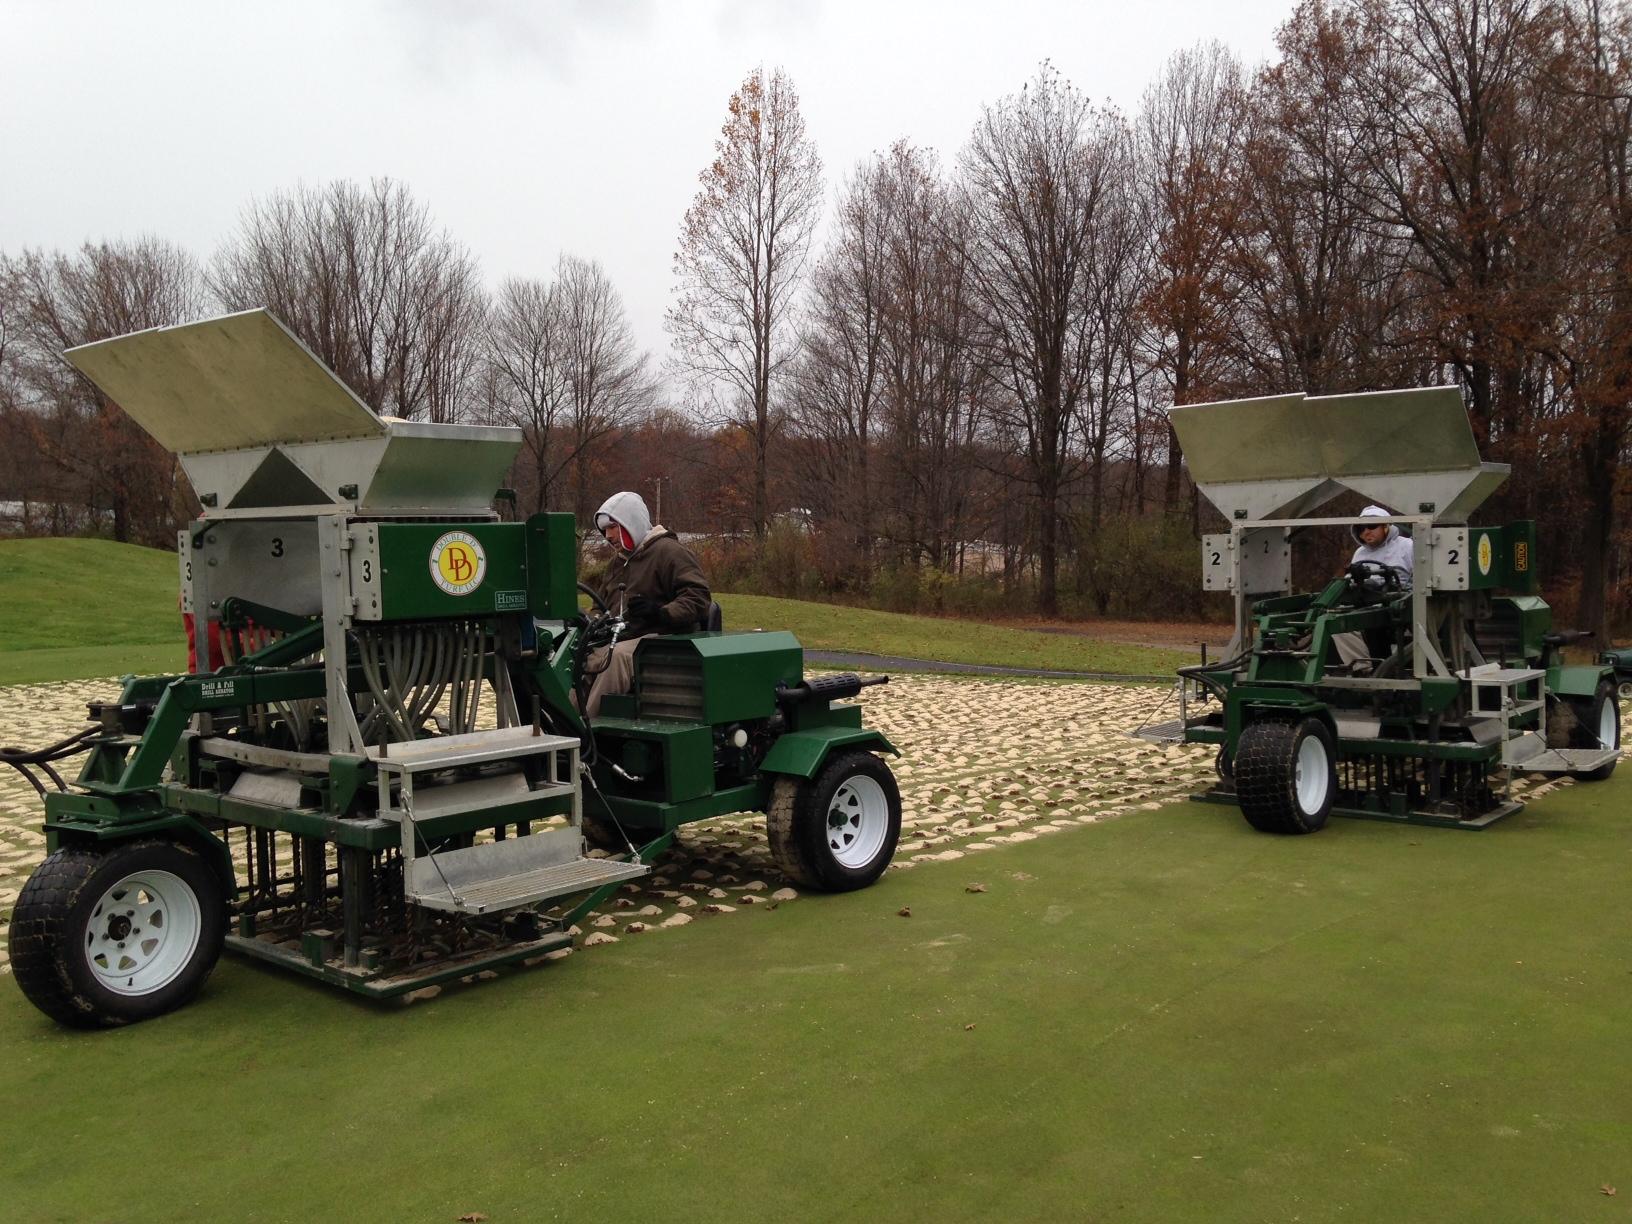 Drill and Fill Golf Greens